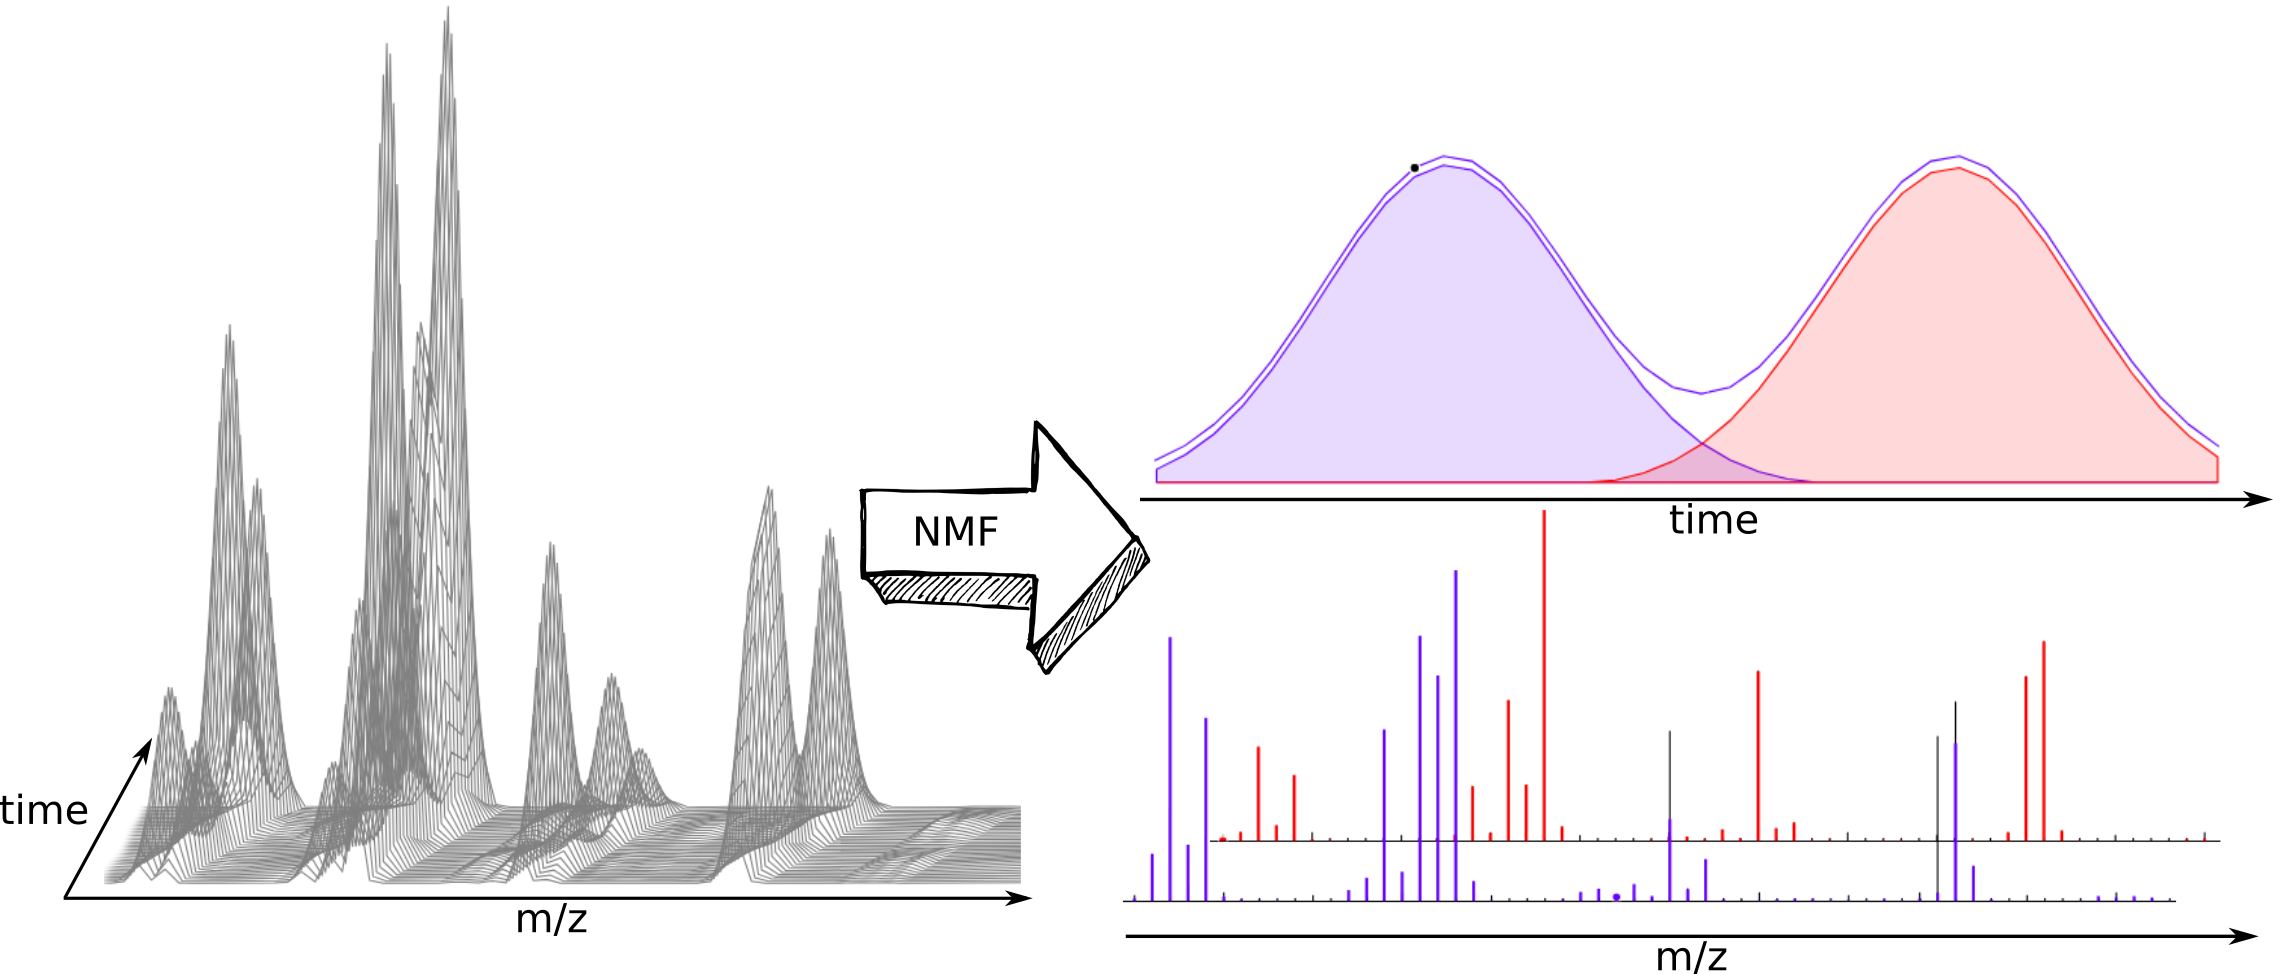 NMReDATA